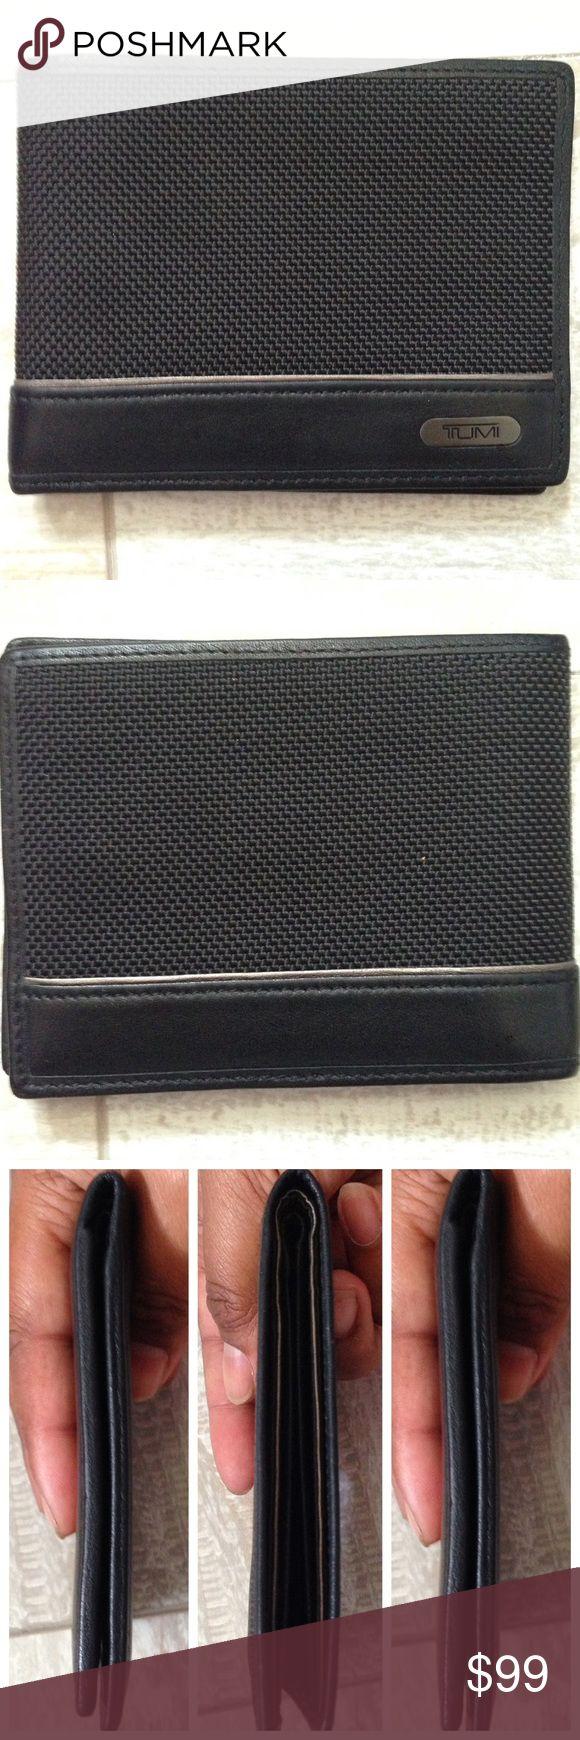 ⚡️SALE TUMI black ballistic leather mens bifold Wa TUMI black ballistic leather mens bifold Wallet  PreLoved  Hardly used No box Tumi Bags Wallets